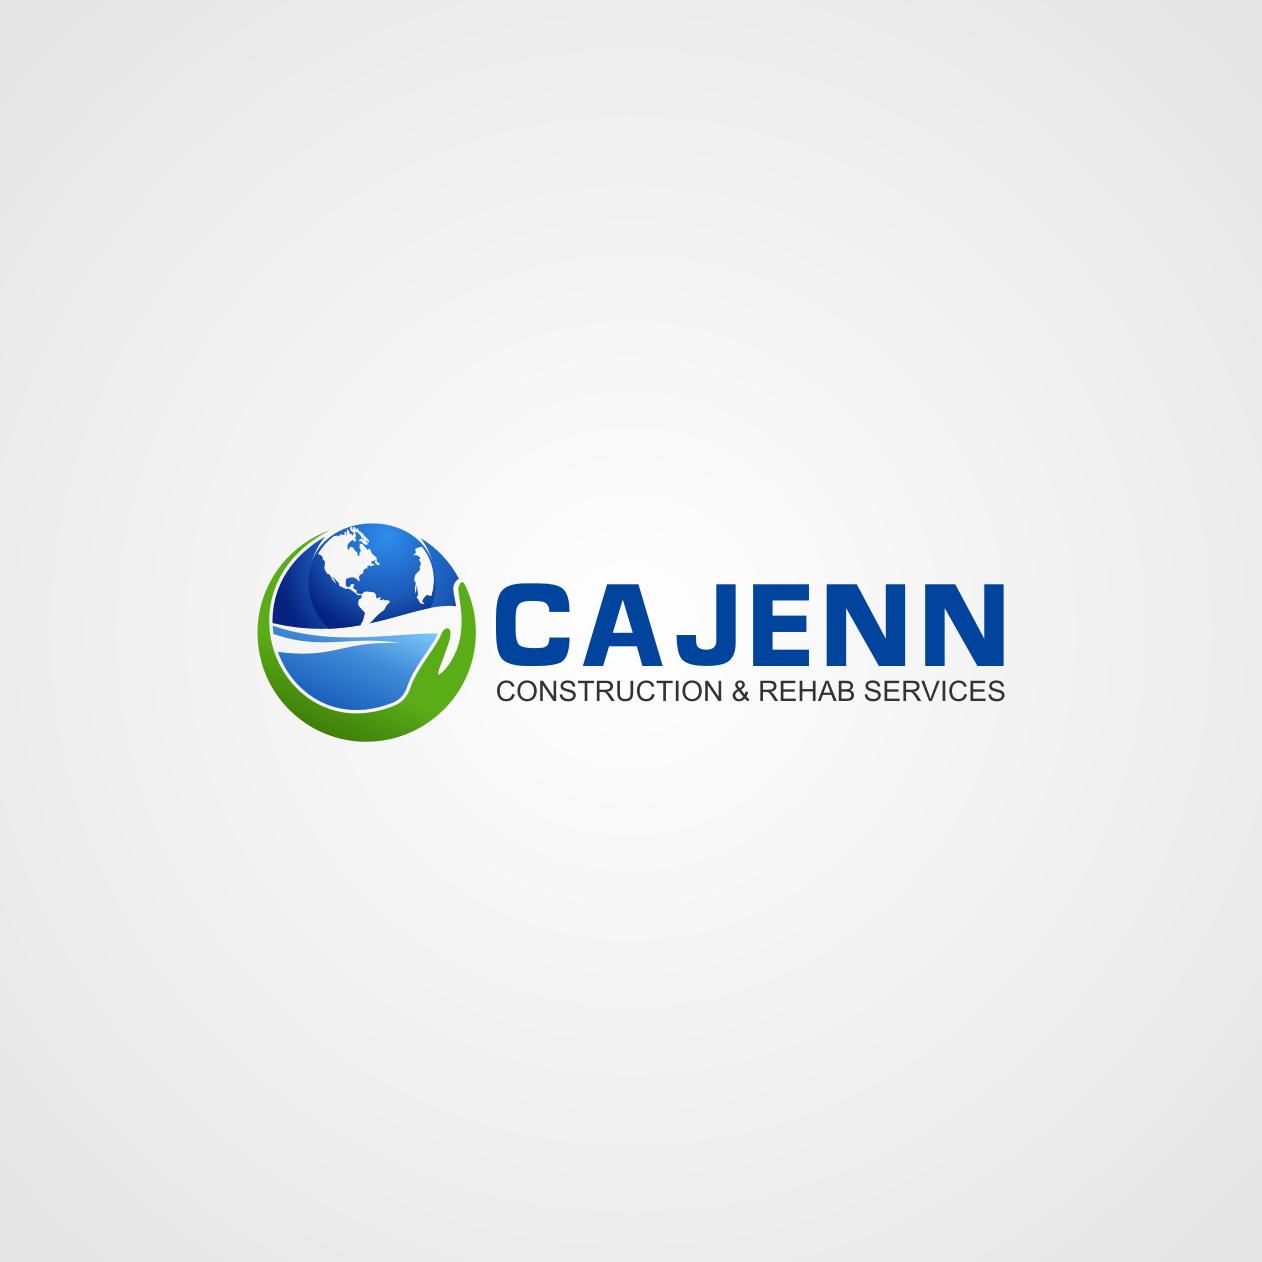 Logo Design by rifatz - Entry No. 14 in the Logo Design Contest New Logo Design for CaJenn Construction & Rehab Services.